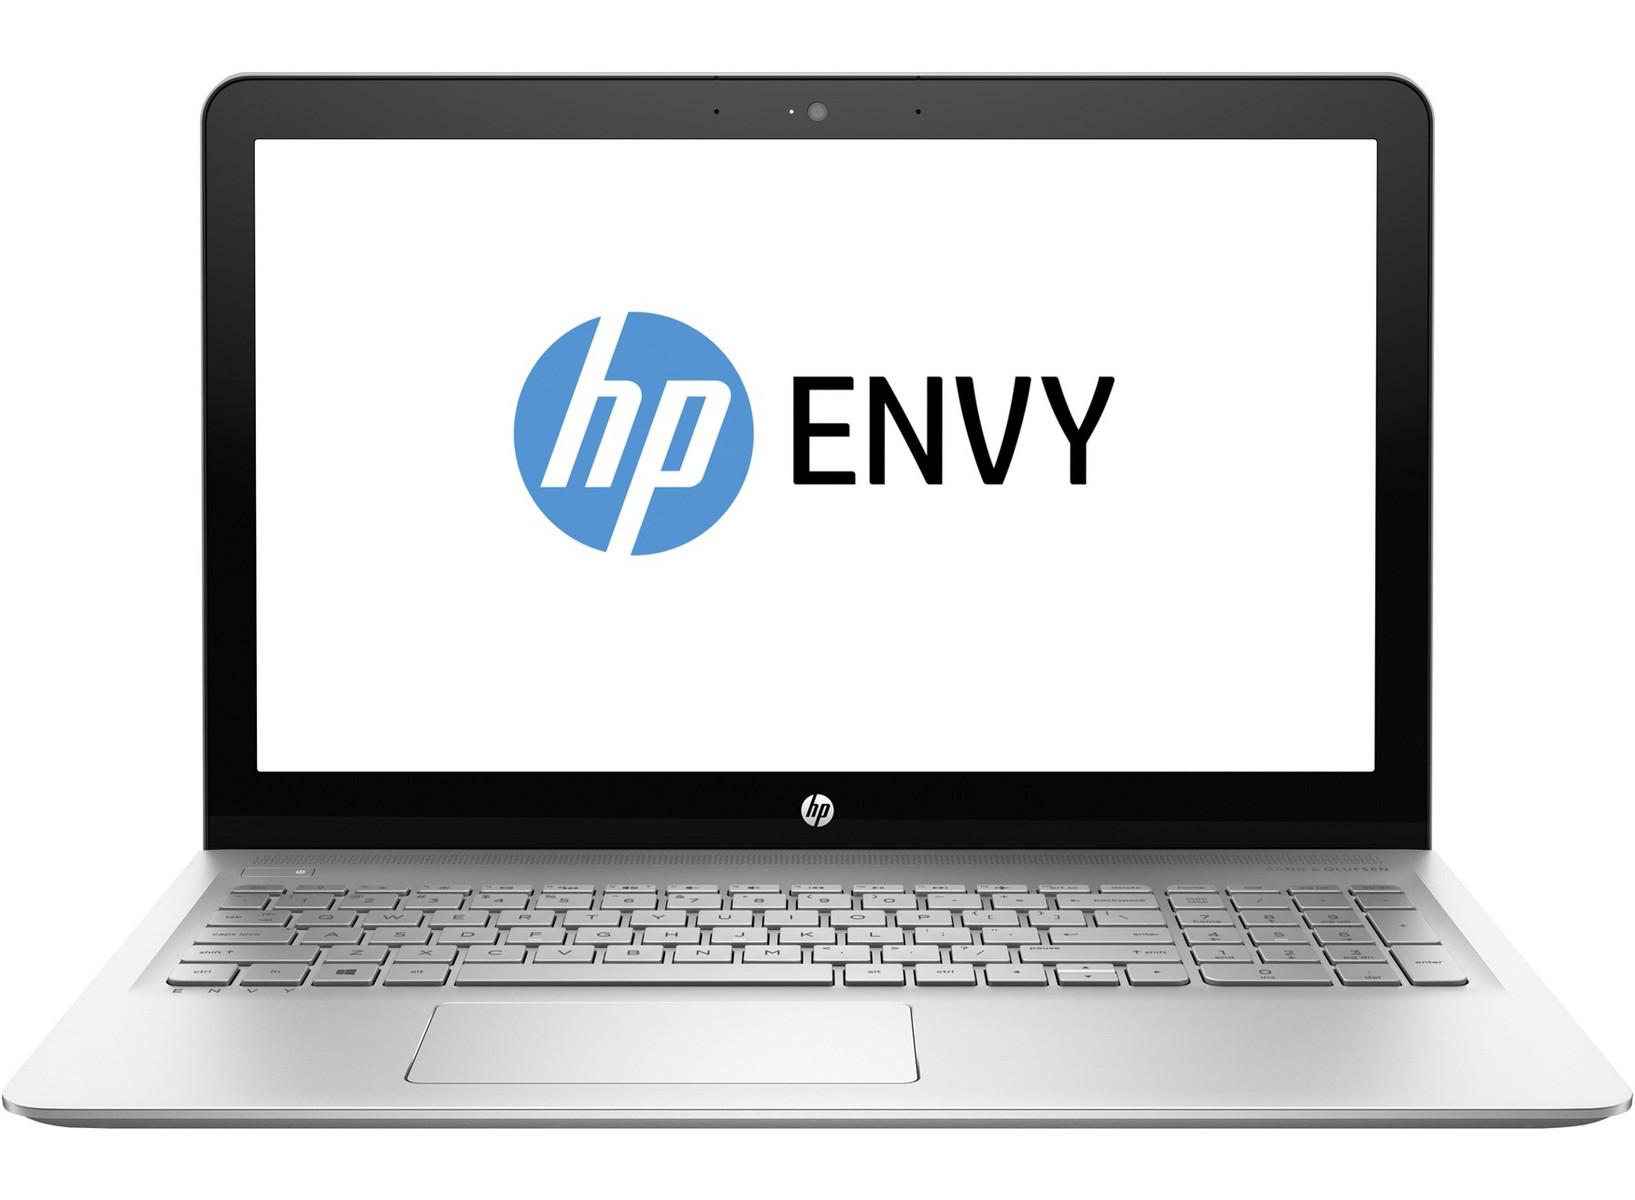 HP Envy 15-as006ng - Notebookcheck.net External Reviews   1635 x 1200 jpeg 143kB